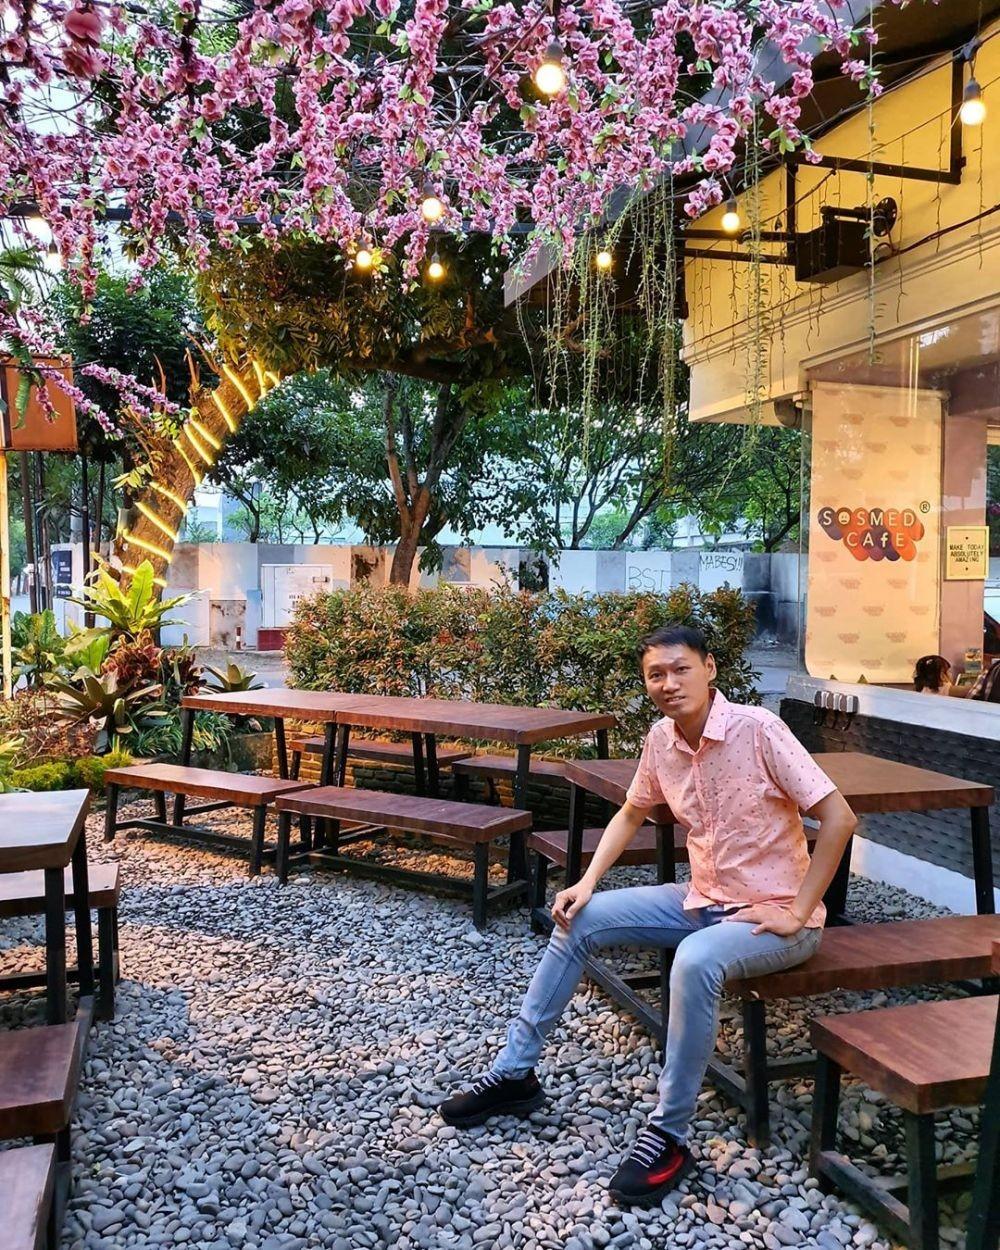 Bikin Lupa Waktu, 8 Rekomendasi Tempat Nongkrong Hits di Medan